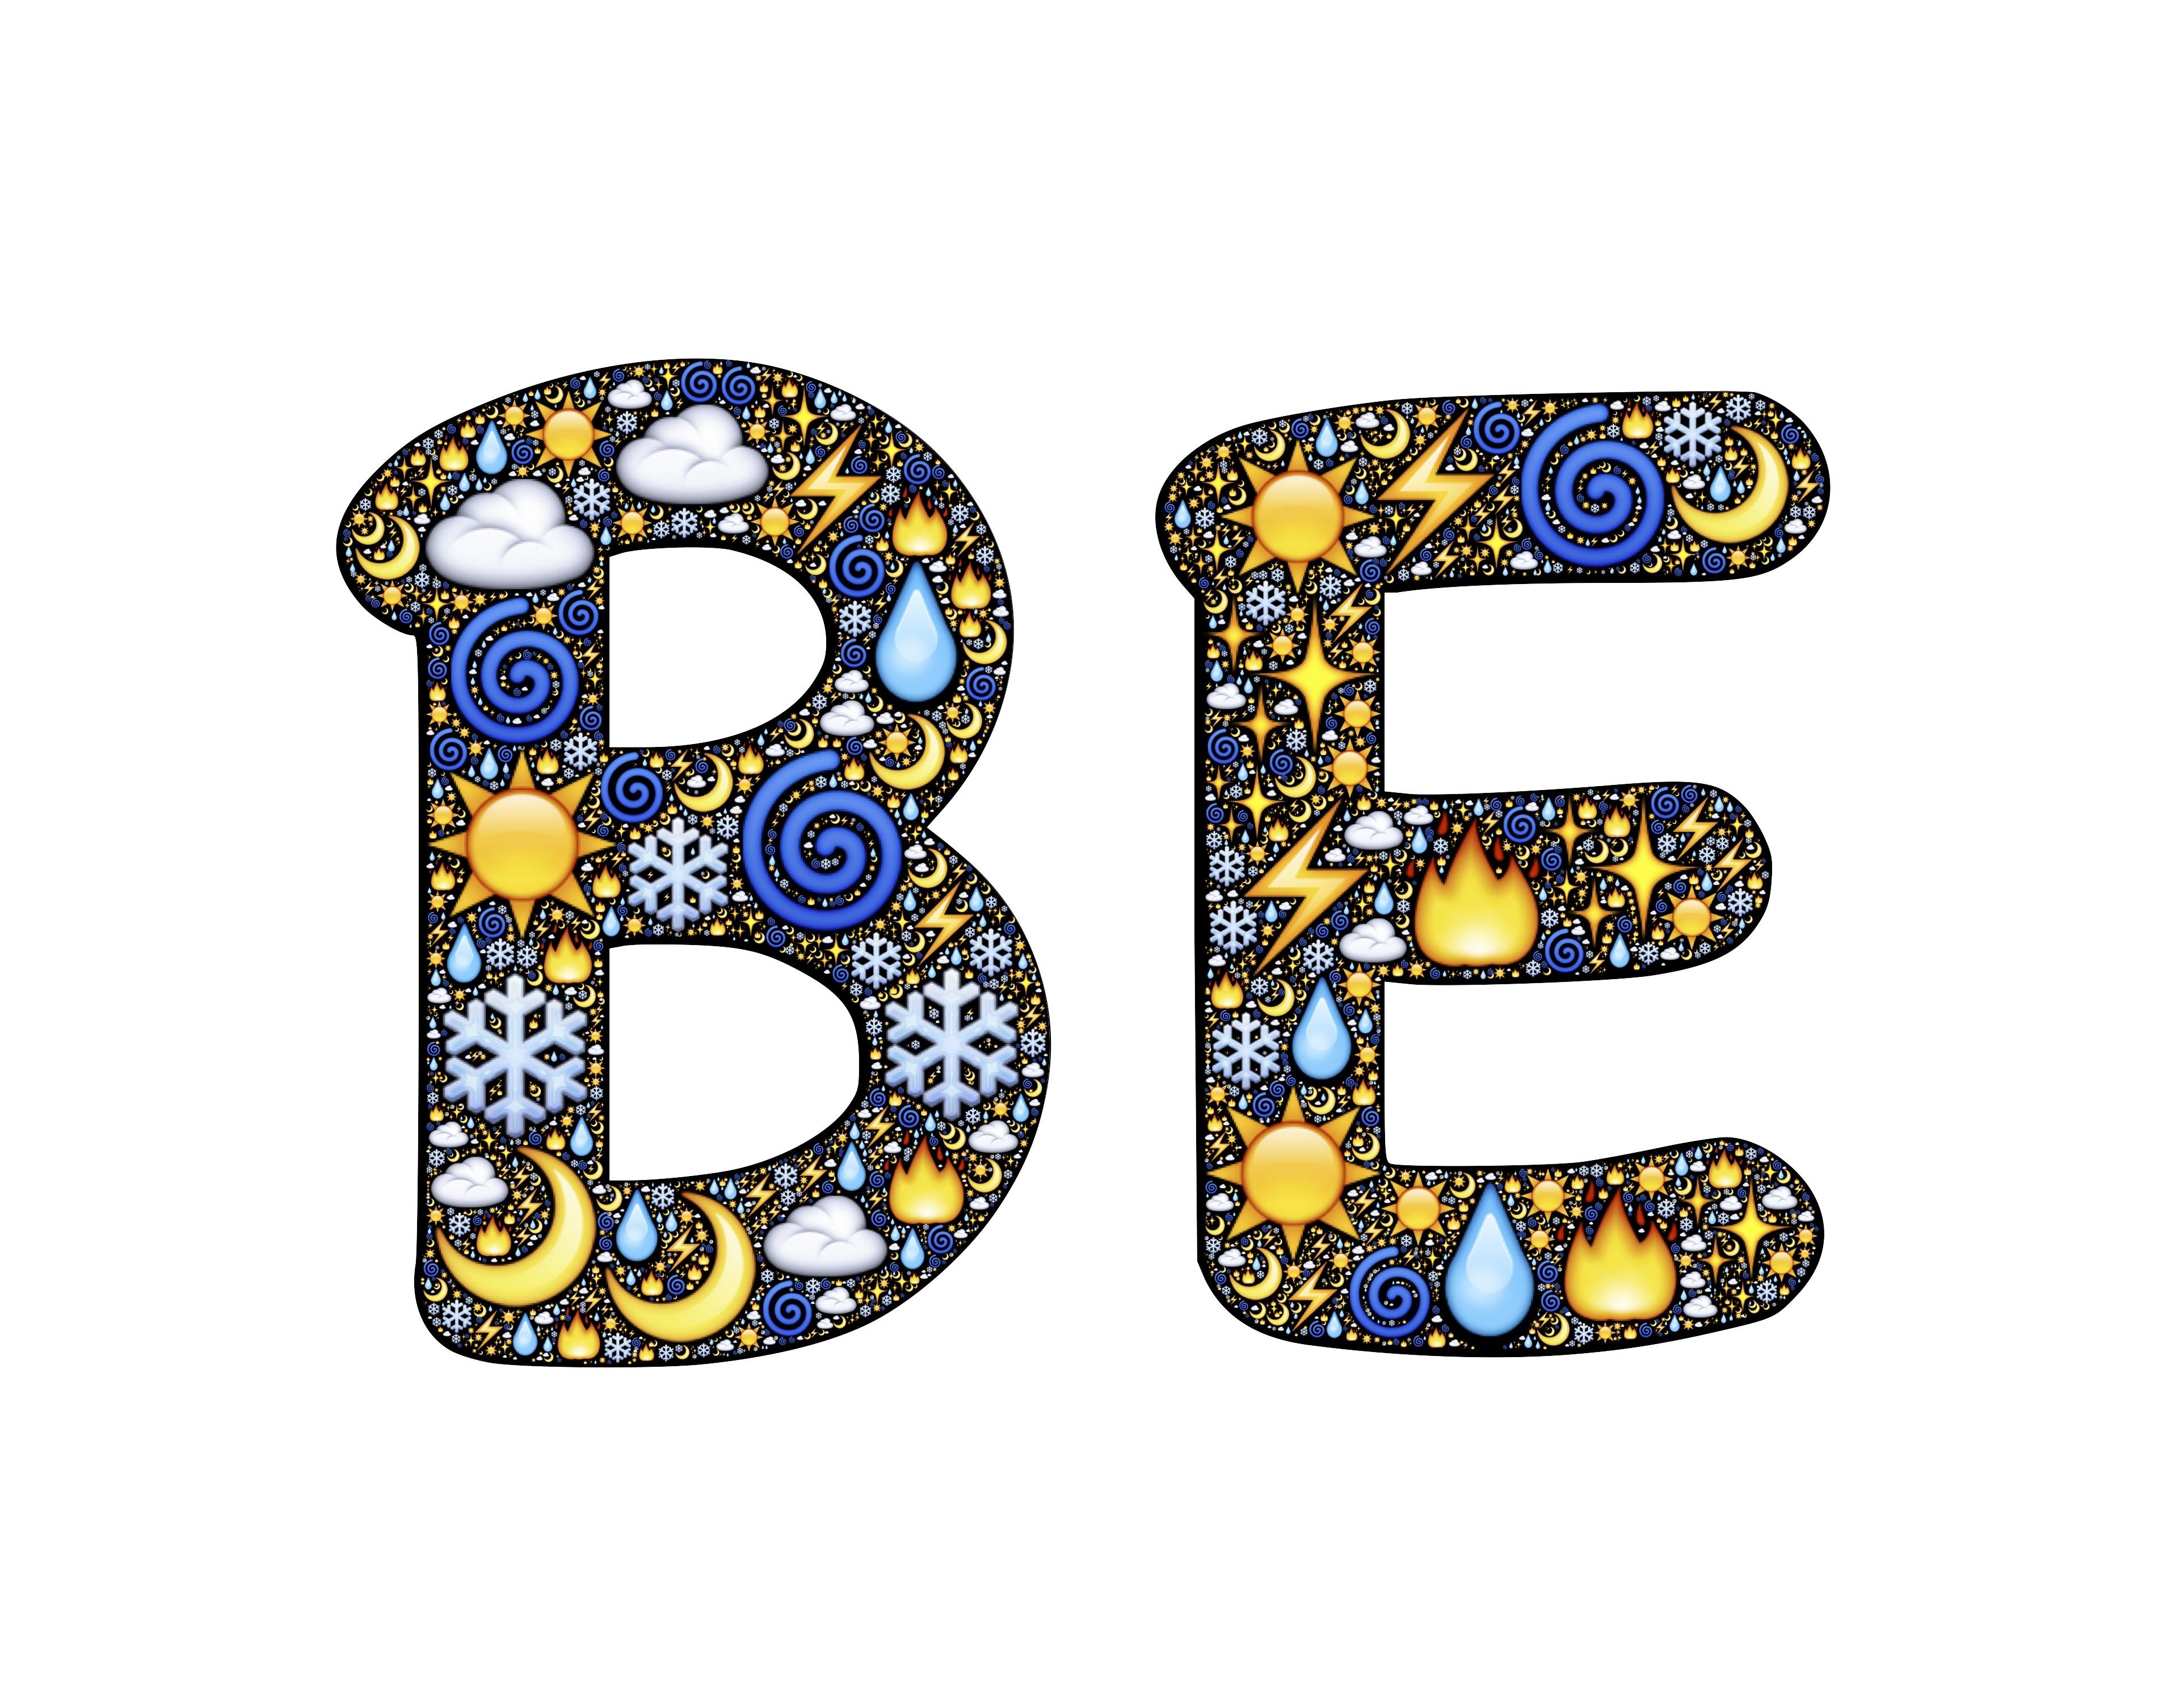 be, www.loveandtreasure.com, Love and Treasure